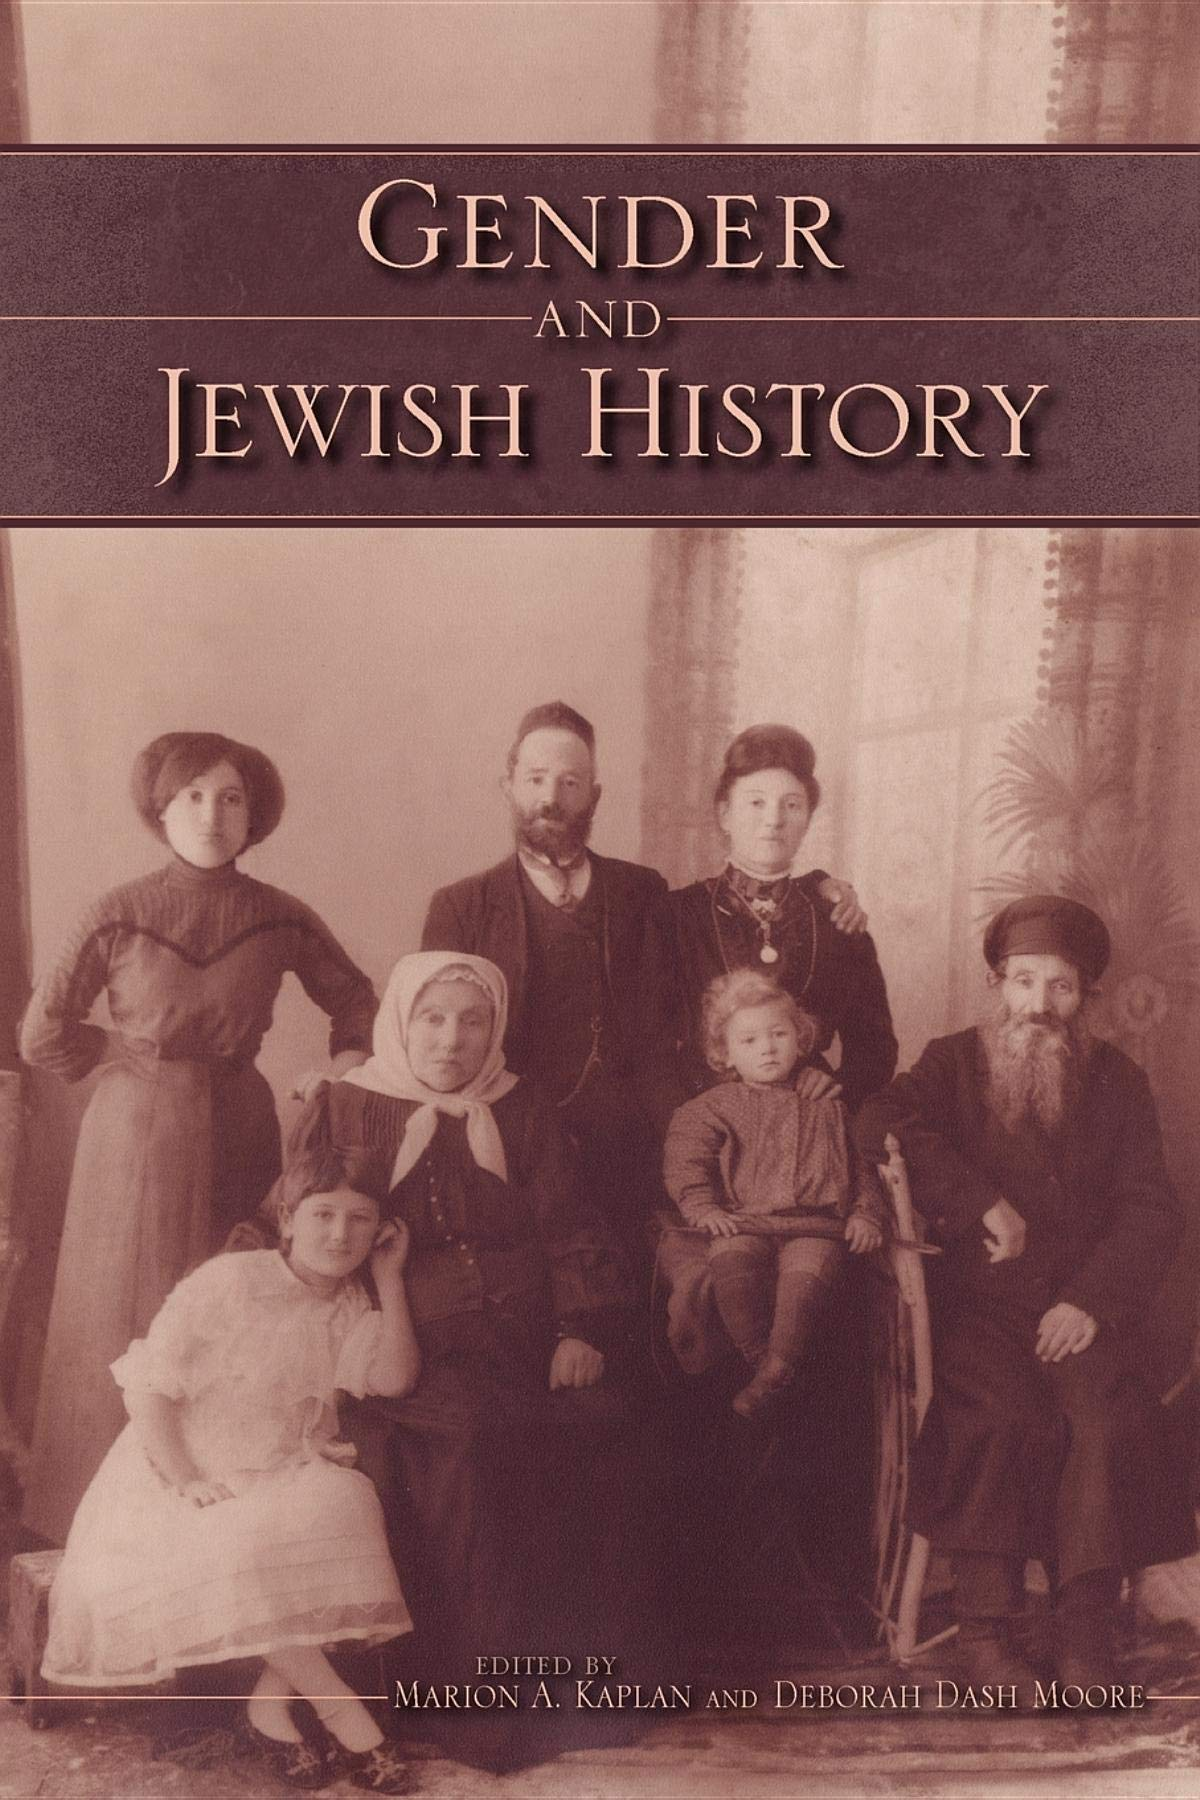 Course history jewish modern vintage photo 410